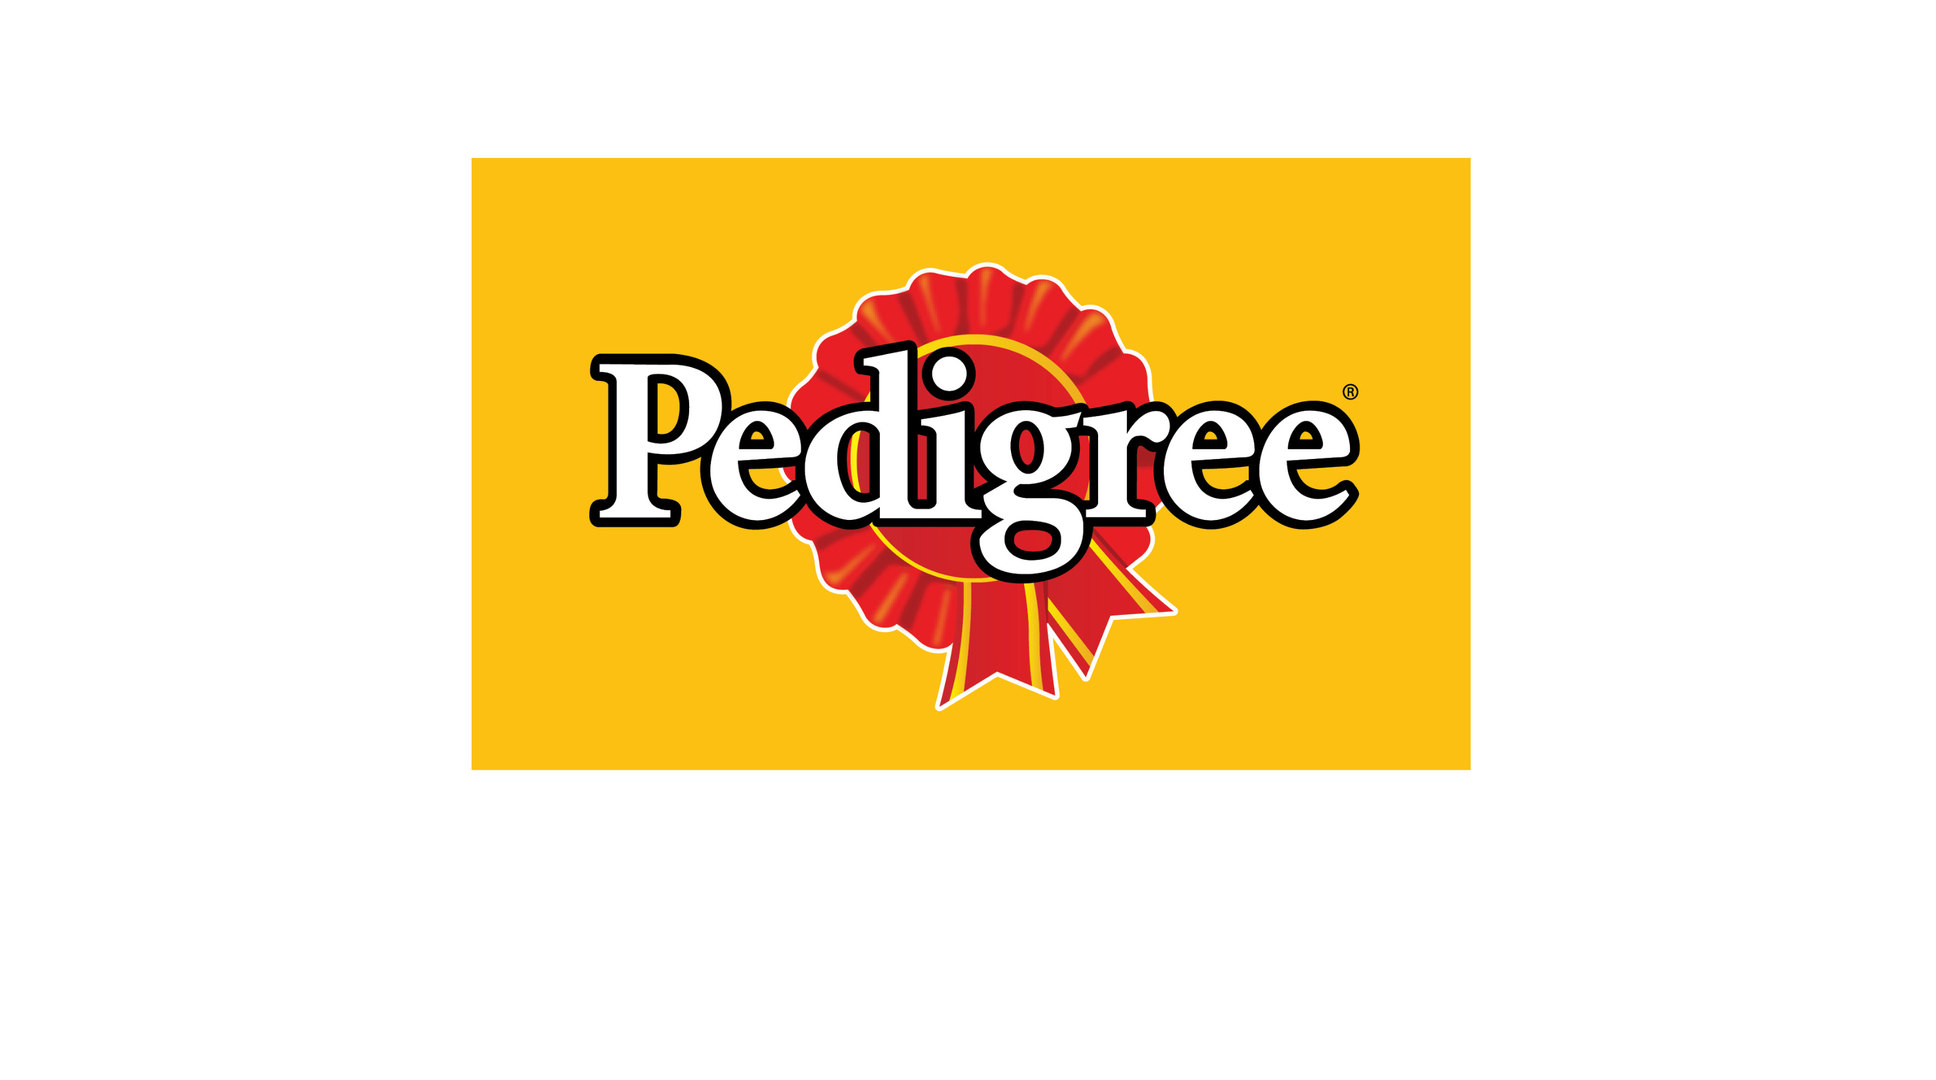 TGD_Pedigree.jpg